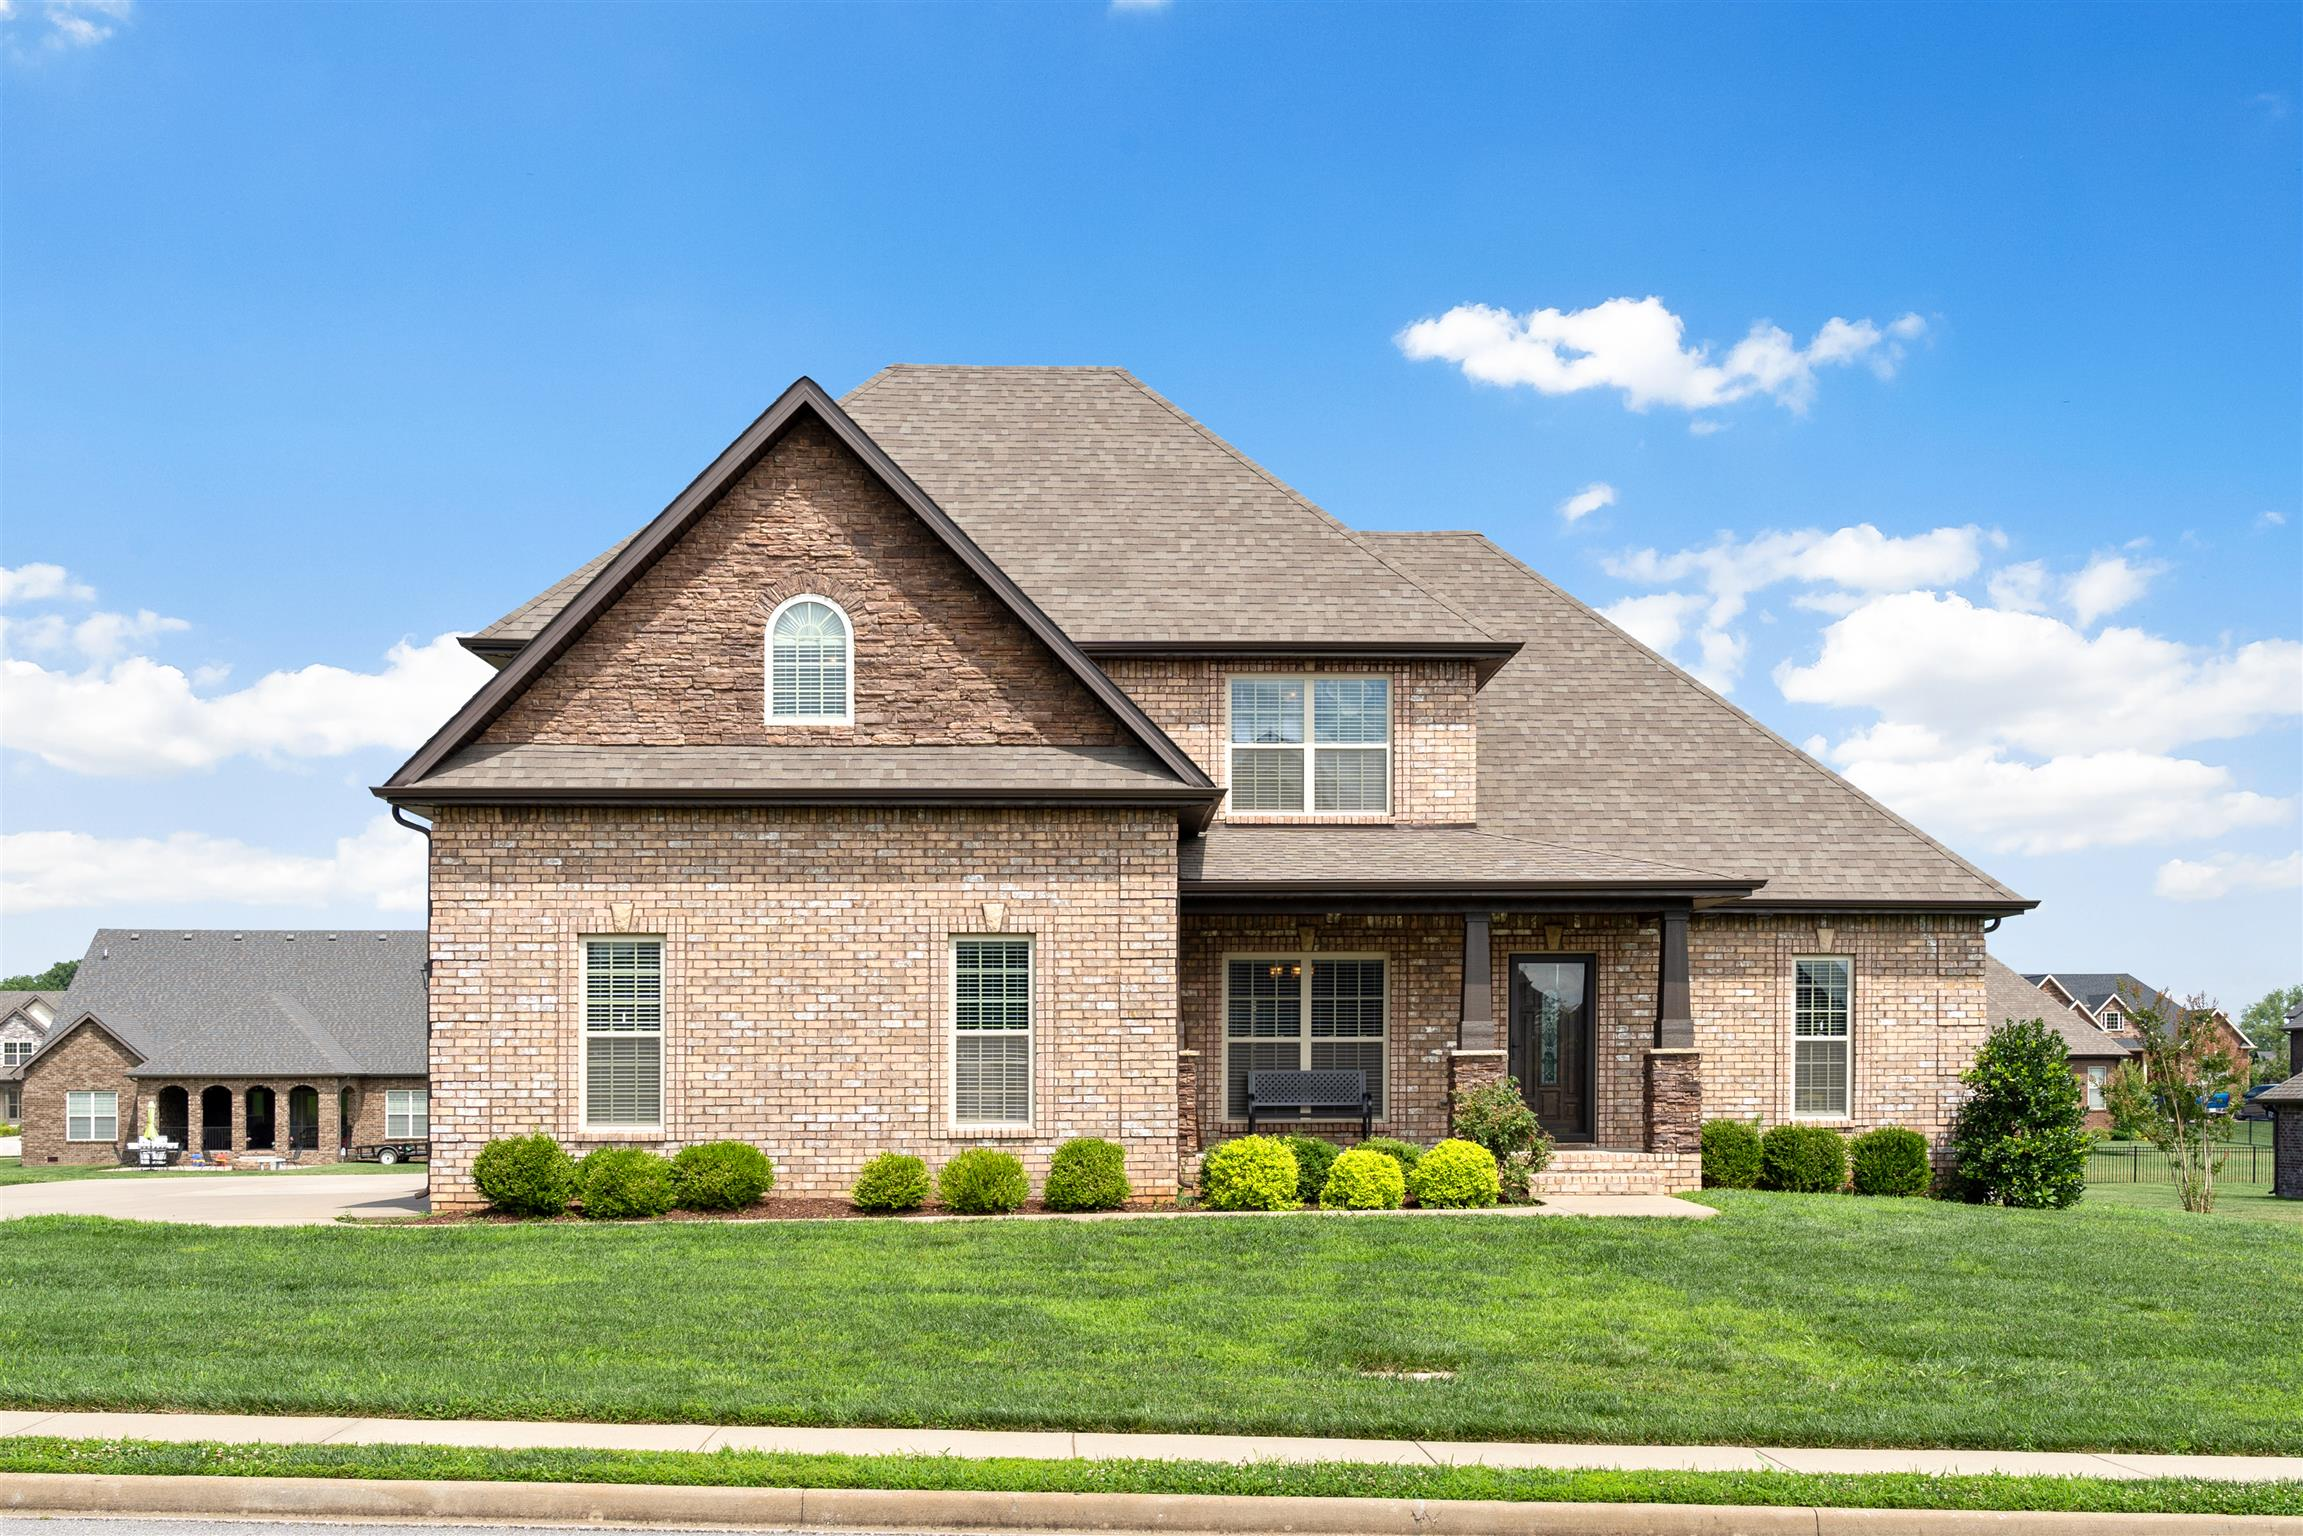 3060 Carrie Taylor Cir, Clarksville, TN 37043 - Clarksville, TN real estate listing